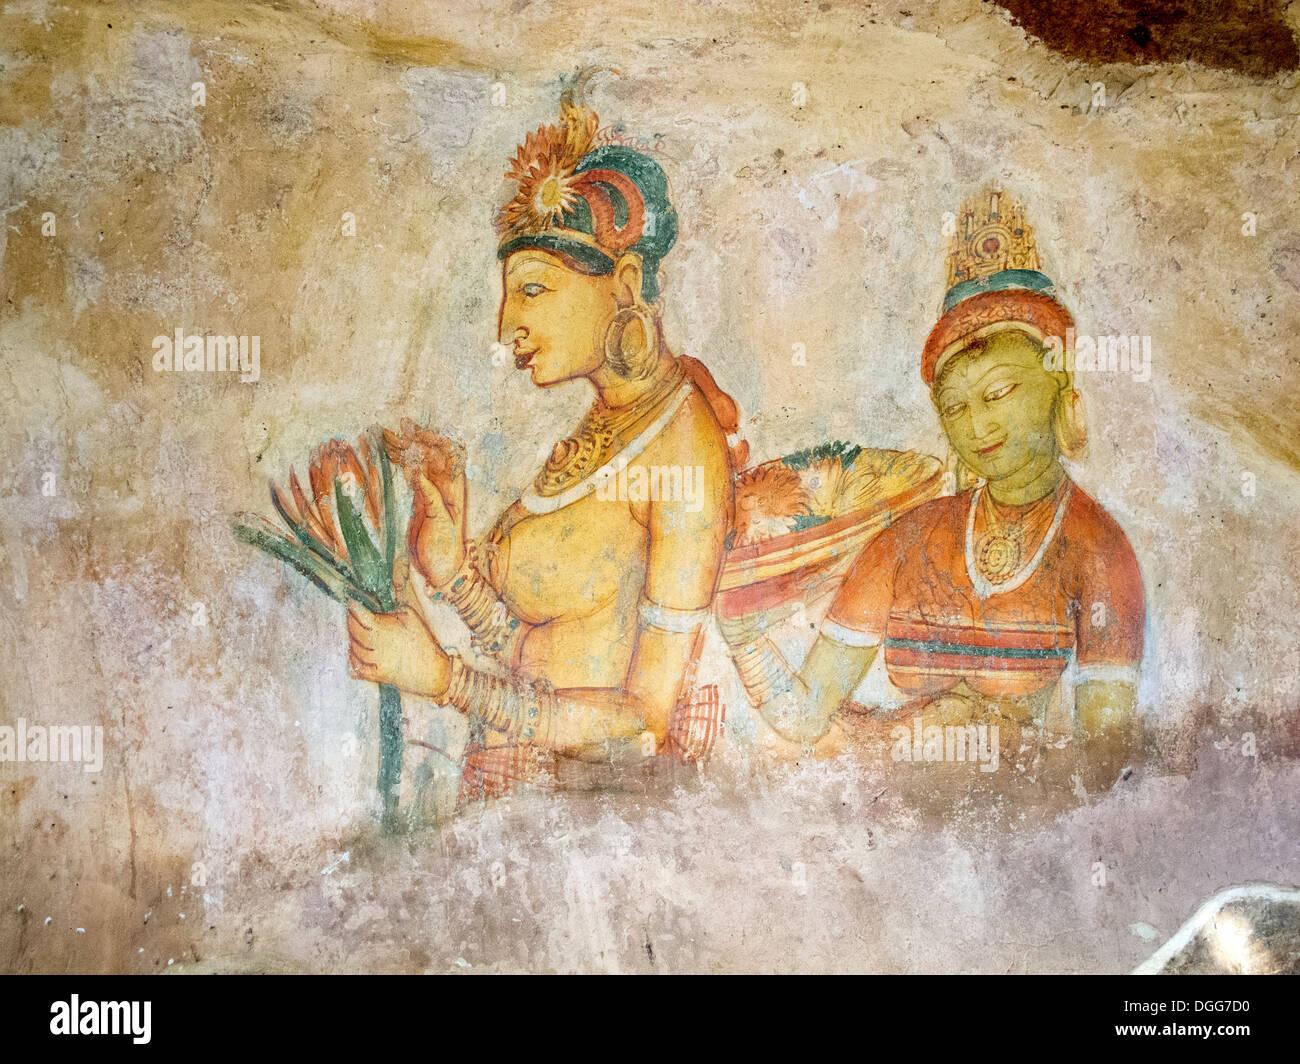 Le miroir au mur , Sri Lanka Sigiriya Photo Stock